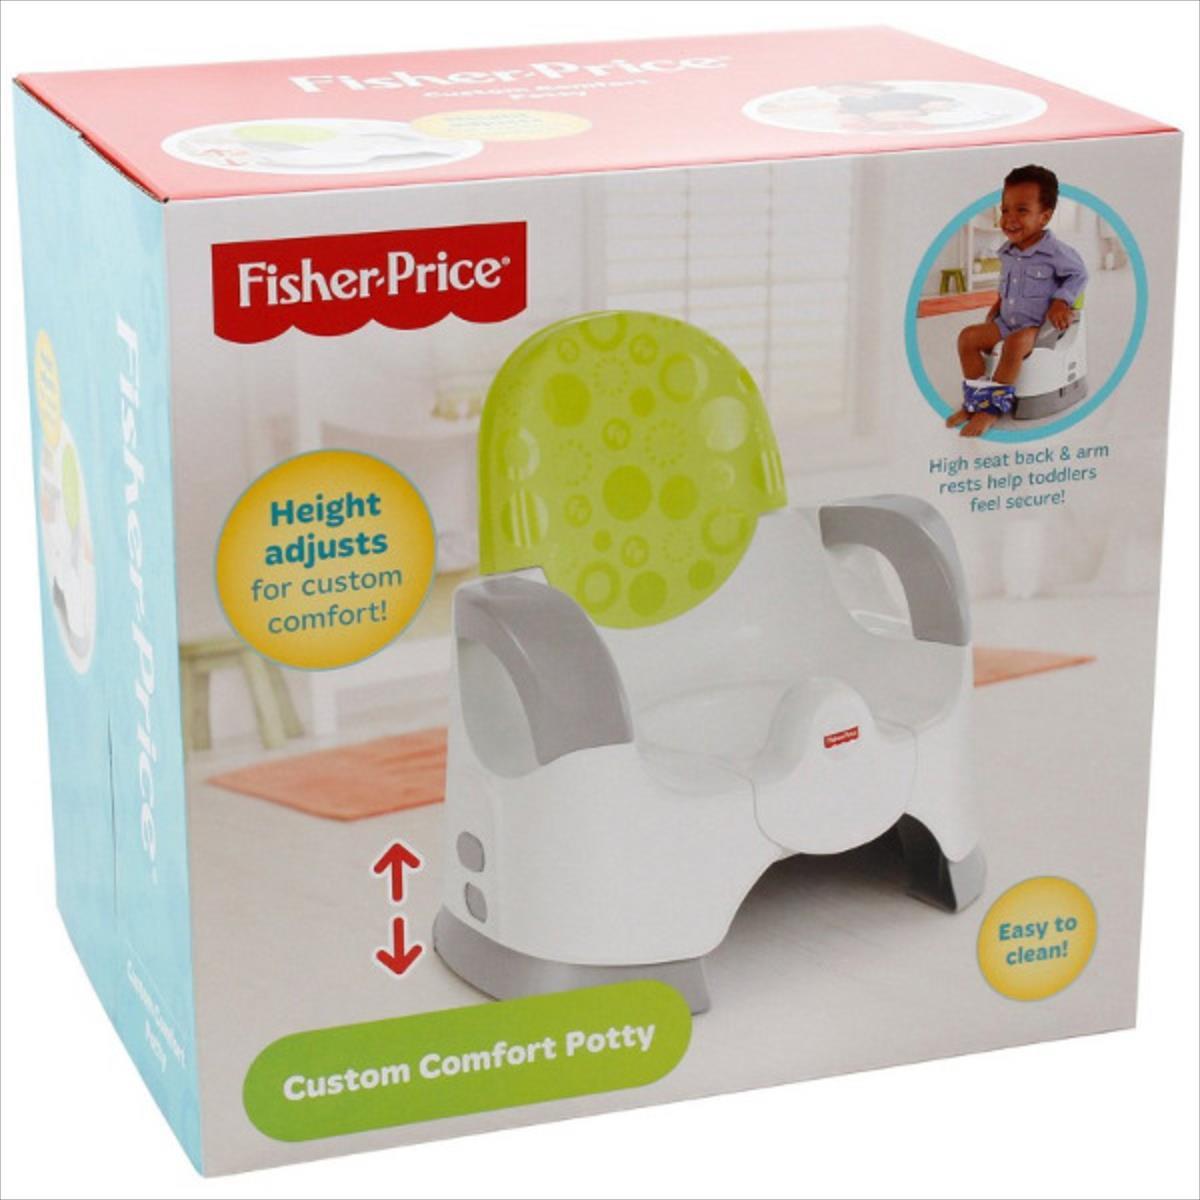 Fisher Price FISHER Green - CBV06 aksesuāri bērniem